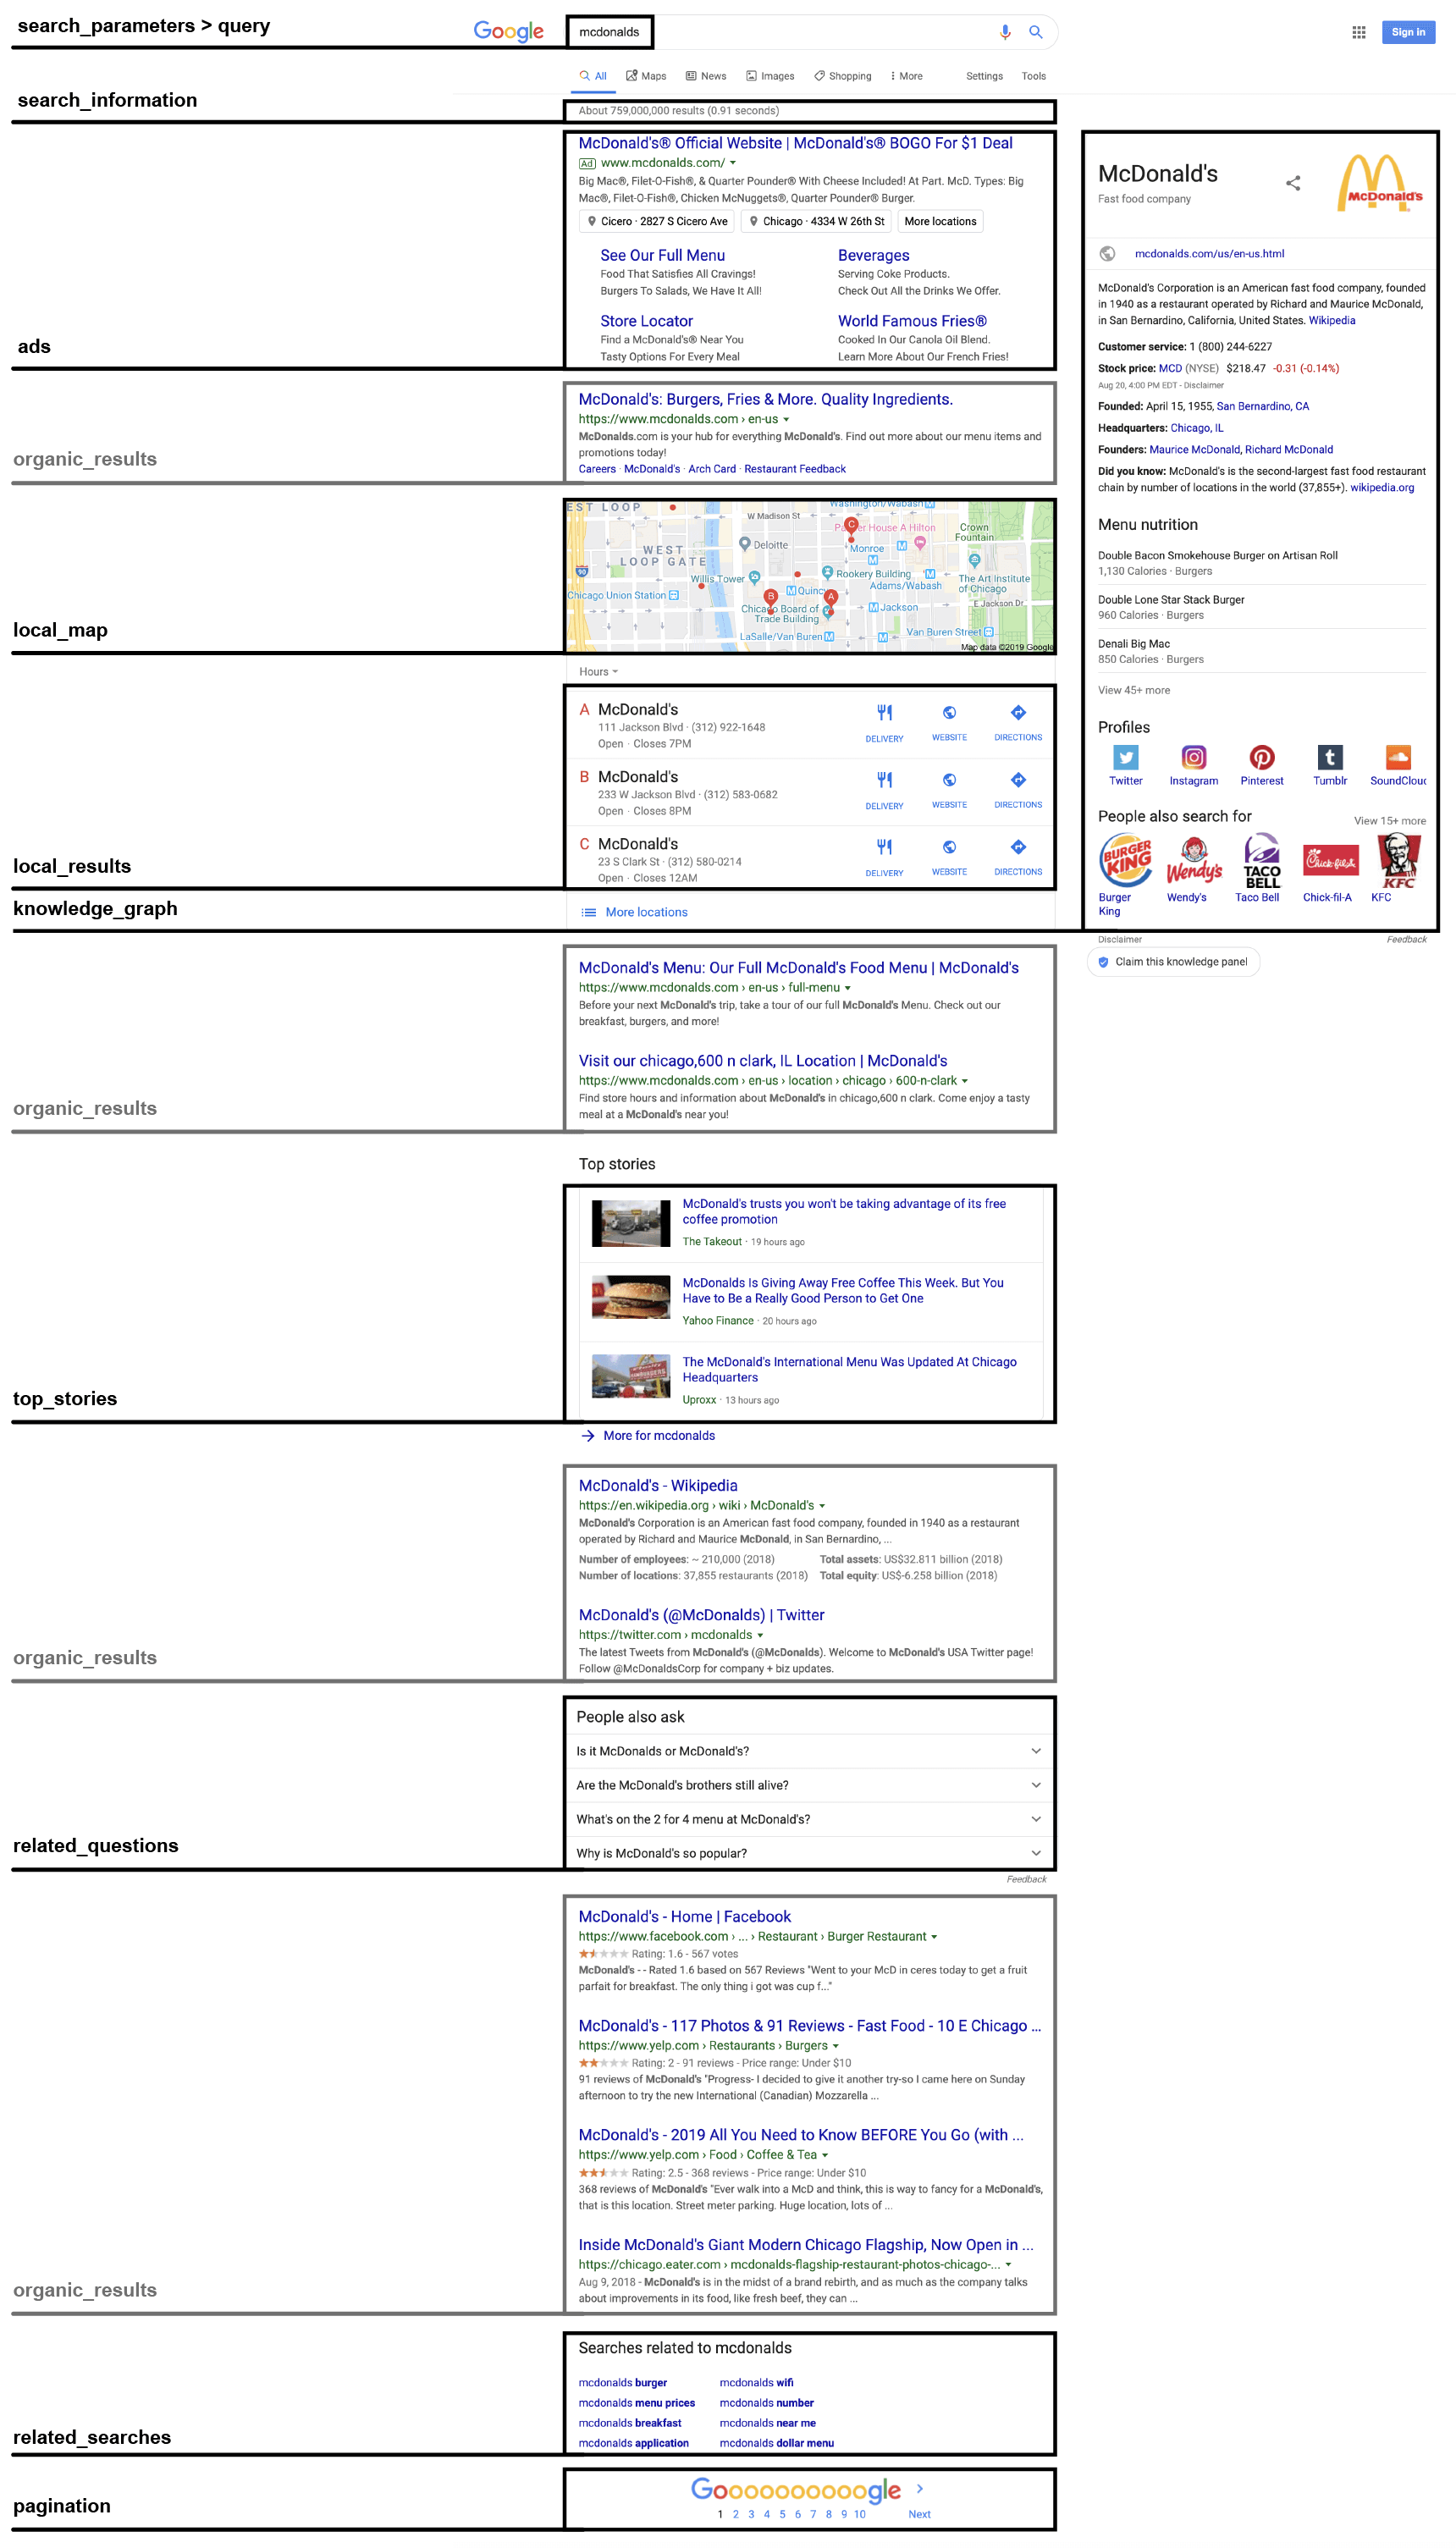 serpstack Google Search API Response